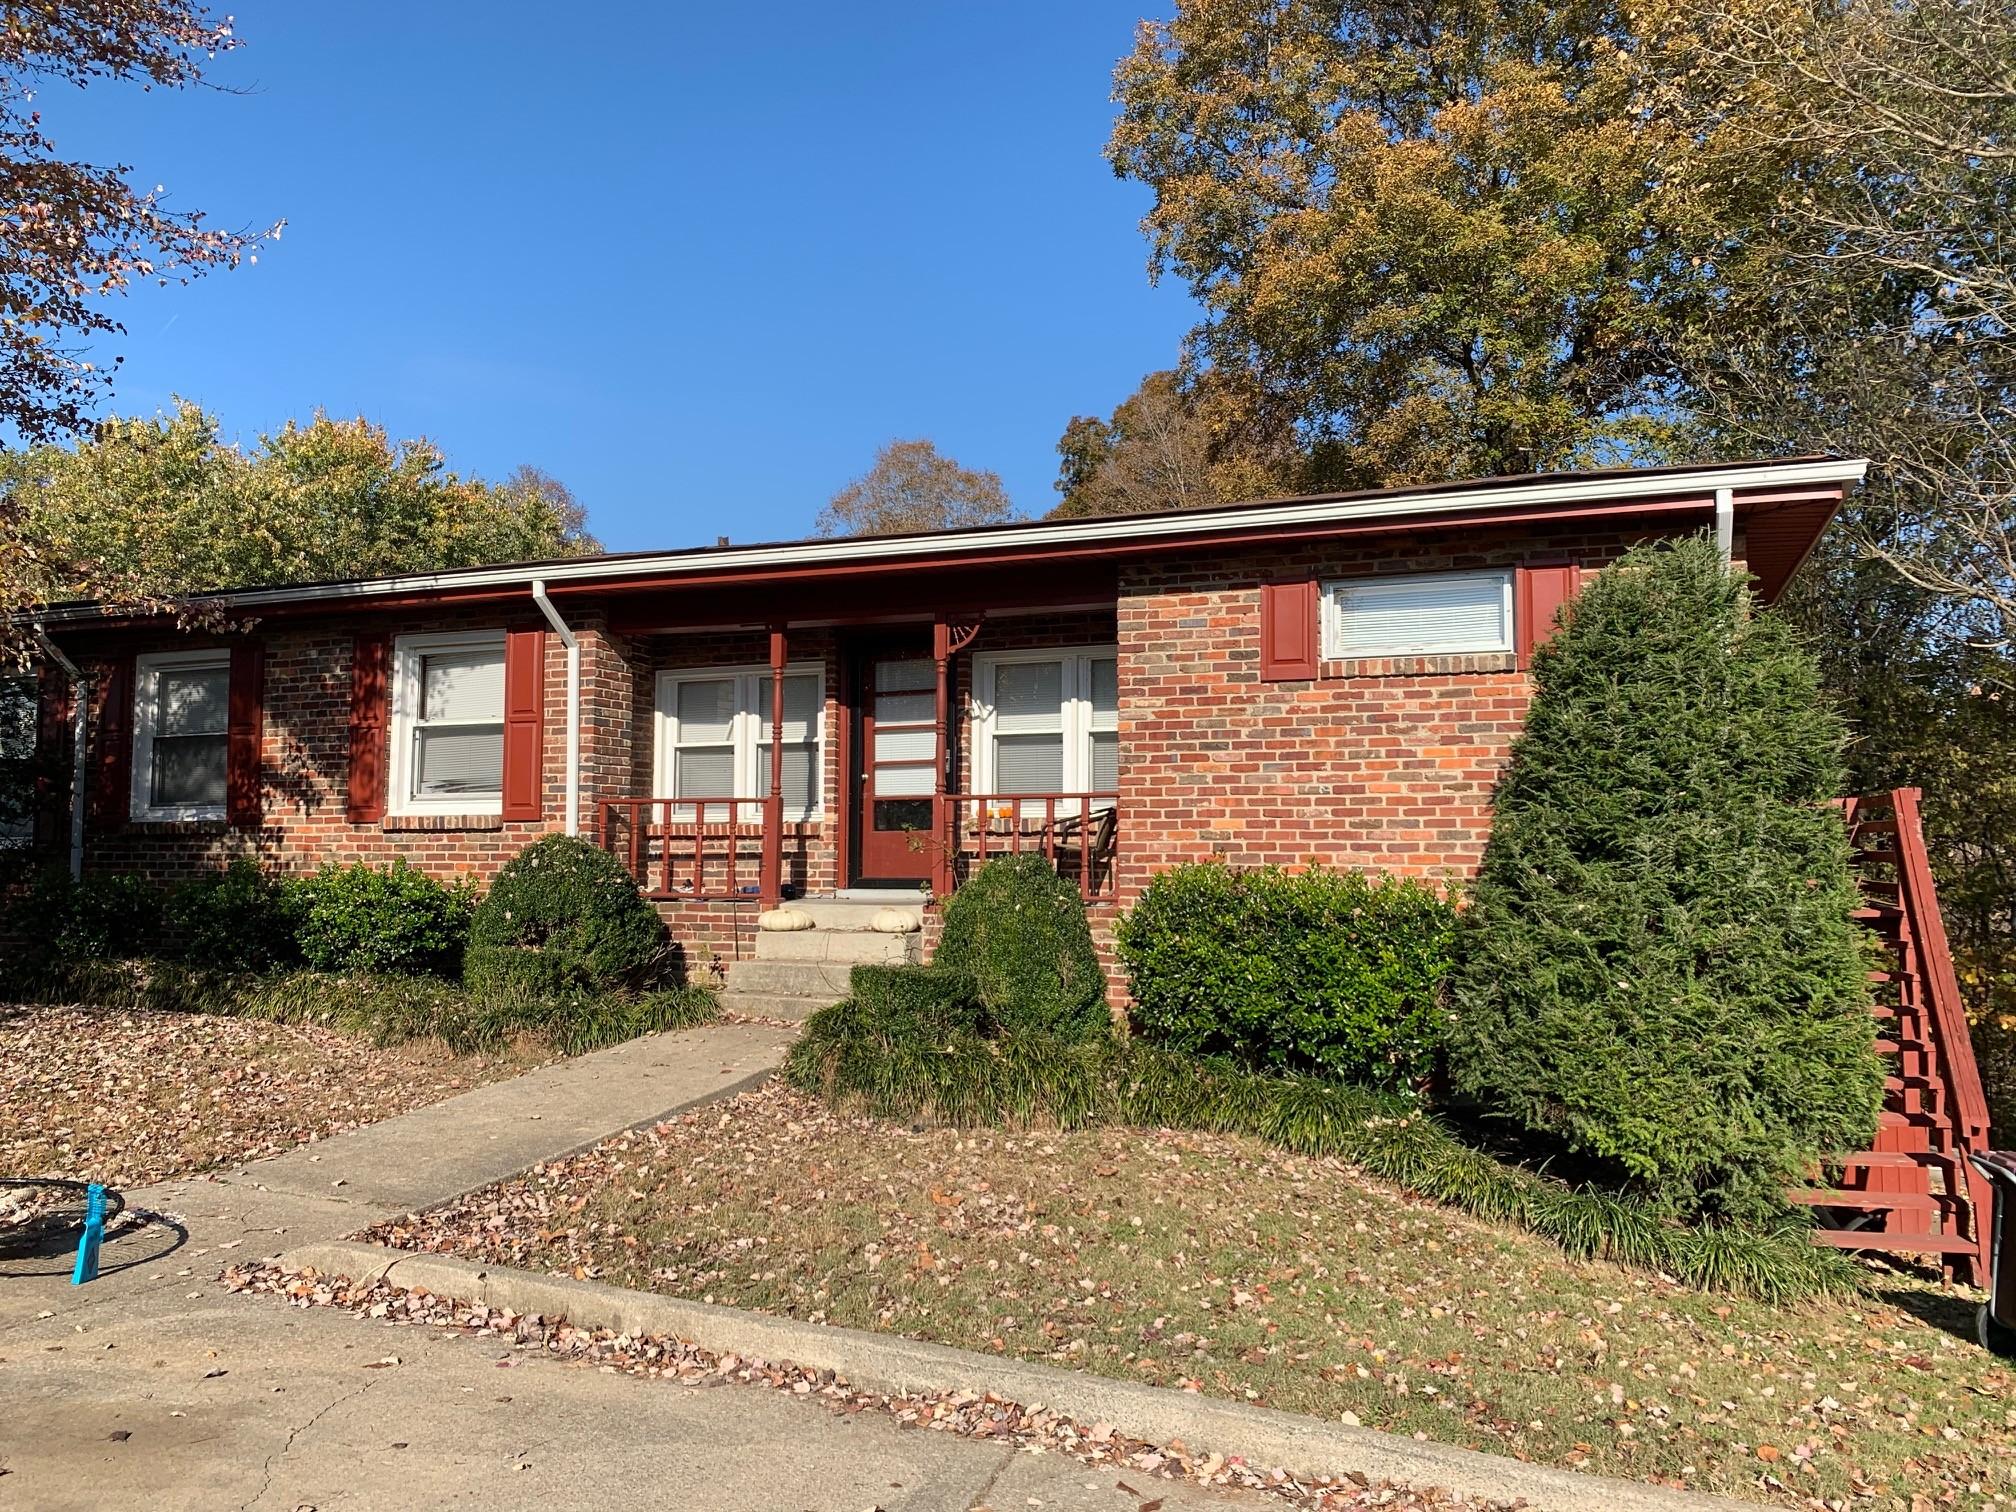 1184 Green Acres Rd, Joelton, TN 37080 - Joelton, TN real estate listing